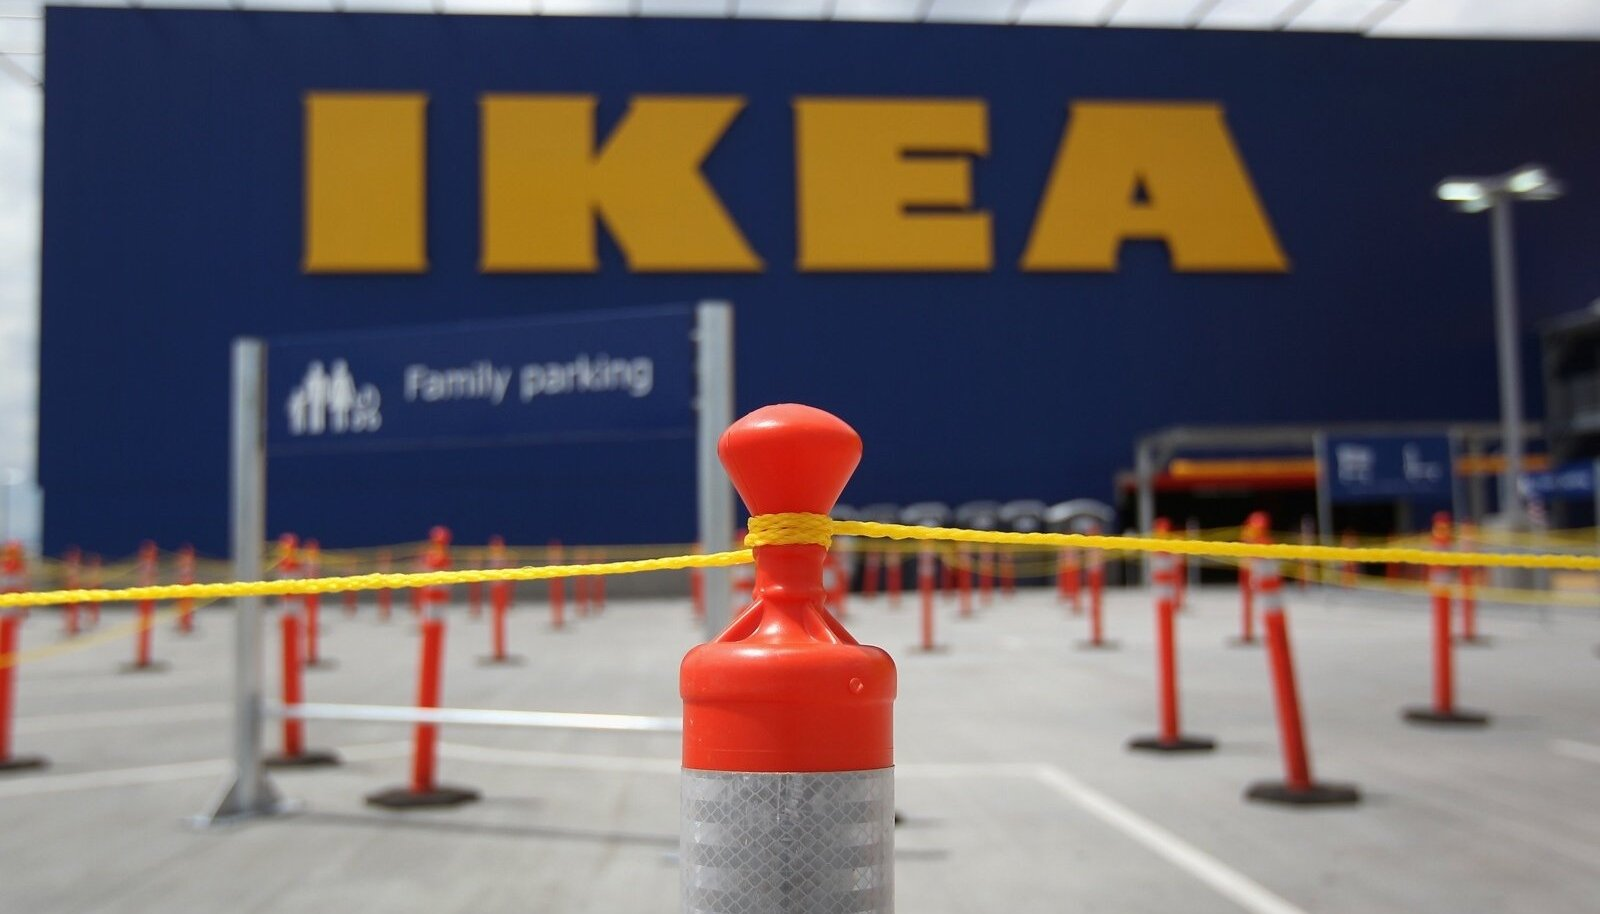 Ikea kauplus Colorados